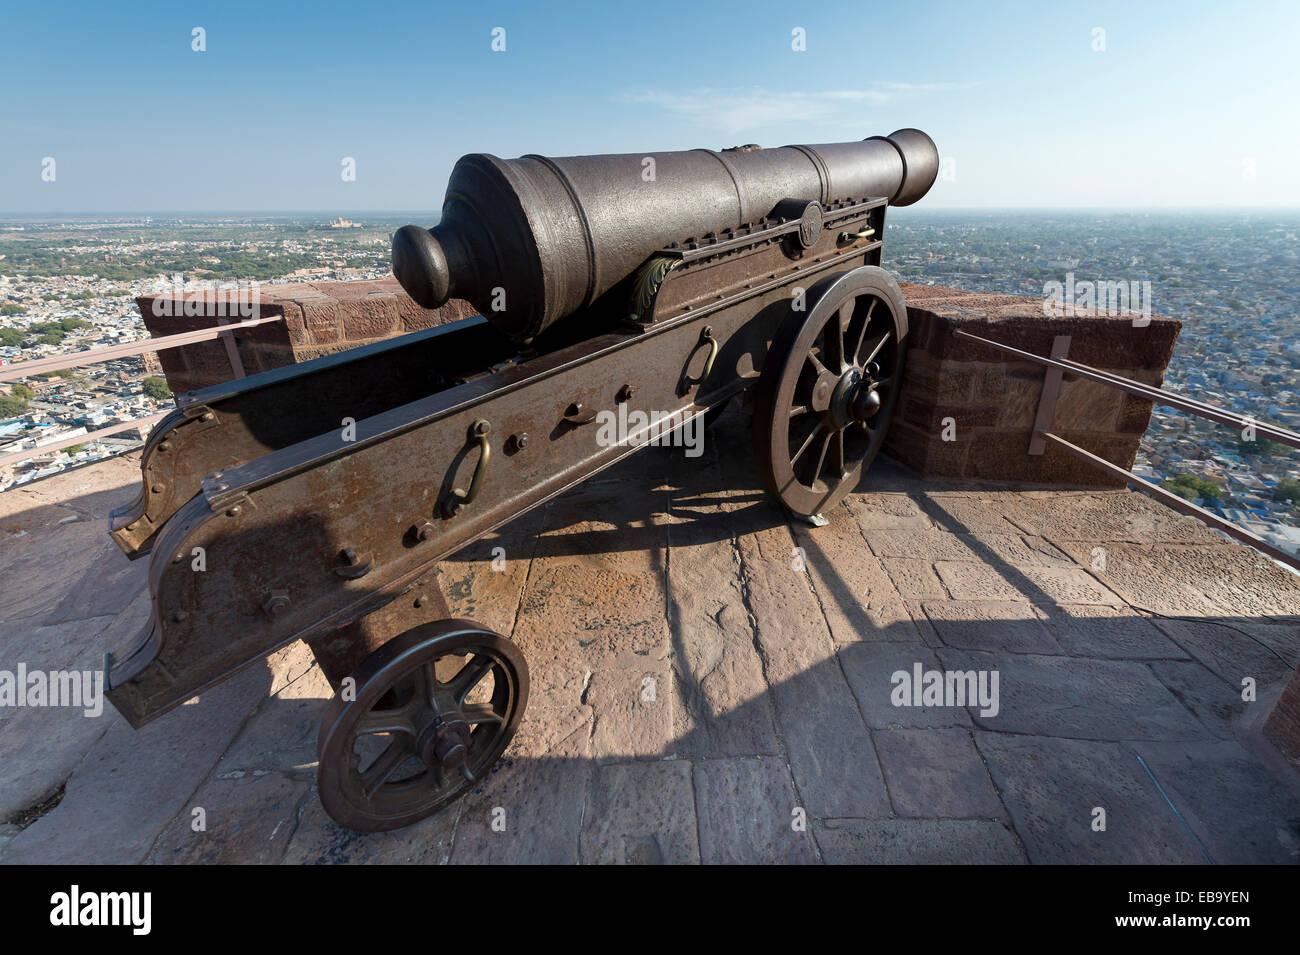 Old cannon, Mehrangarh Fort, Jodhpur, Rajasthan, India - Stock Image